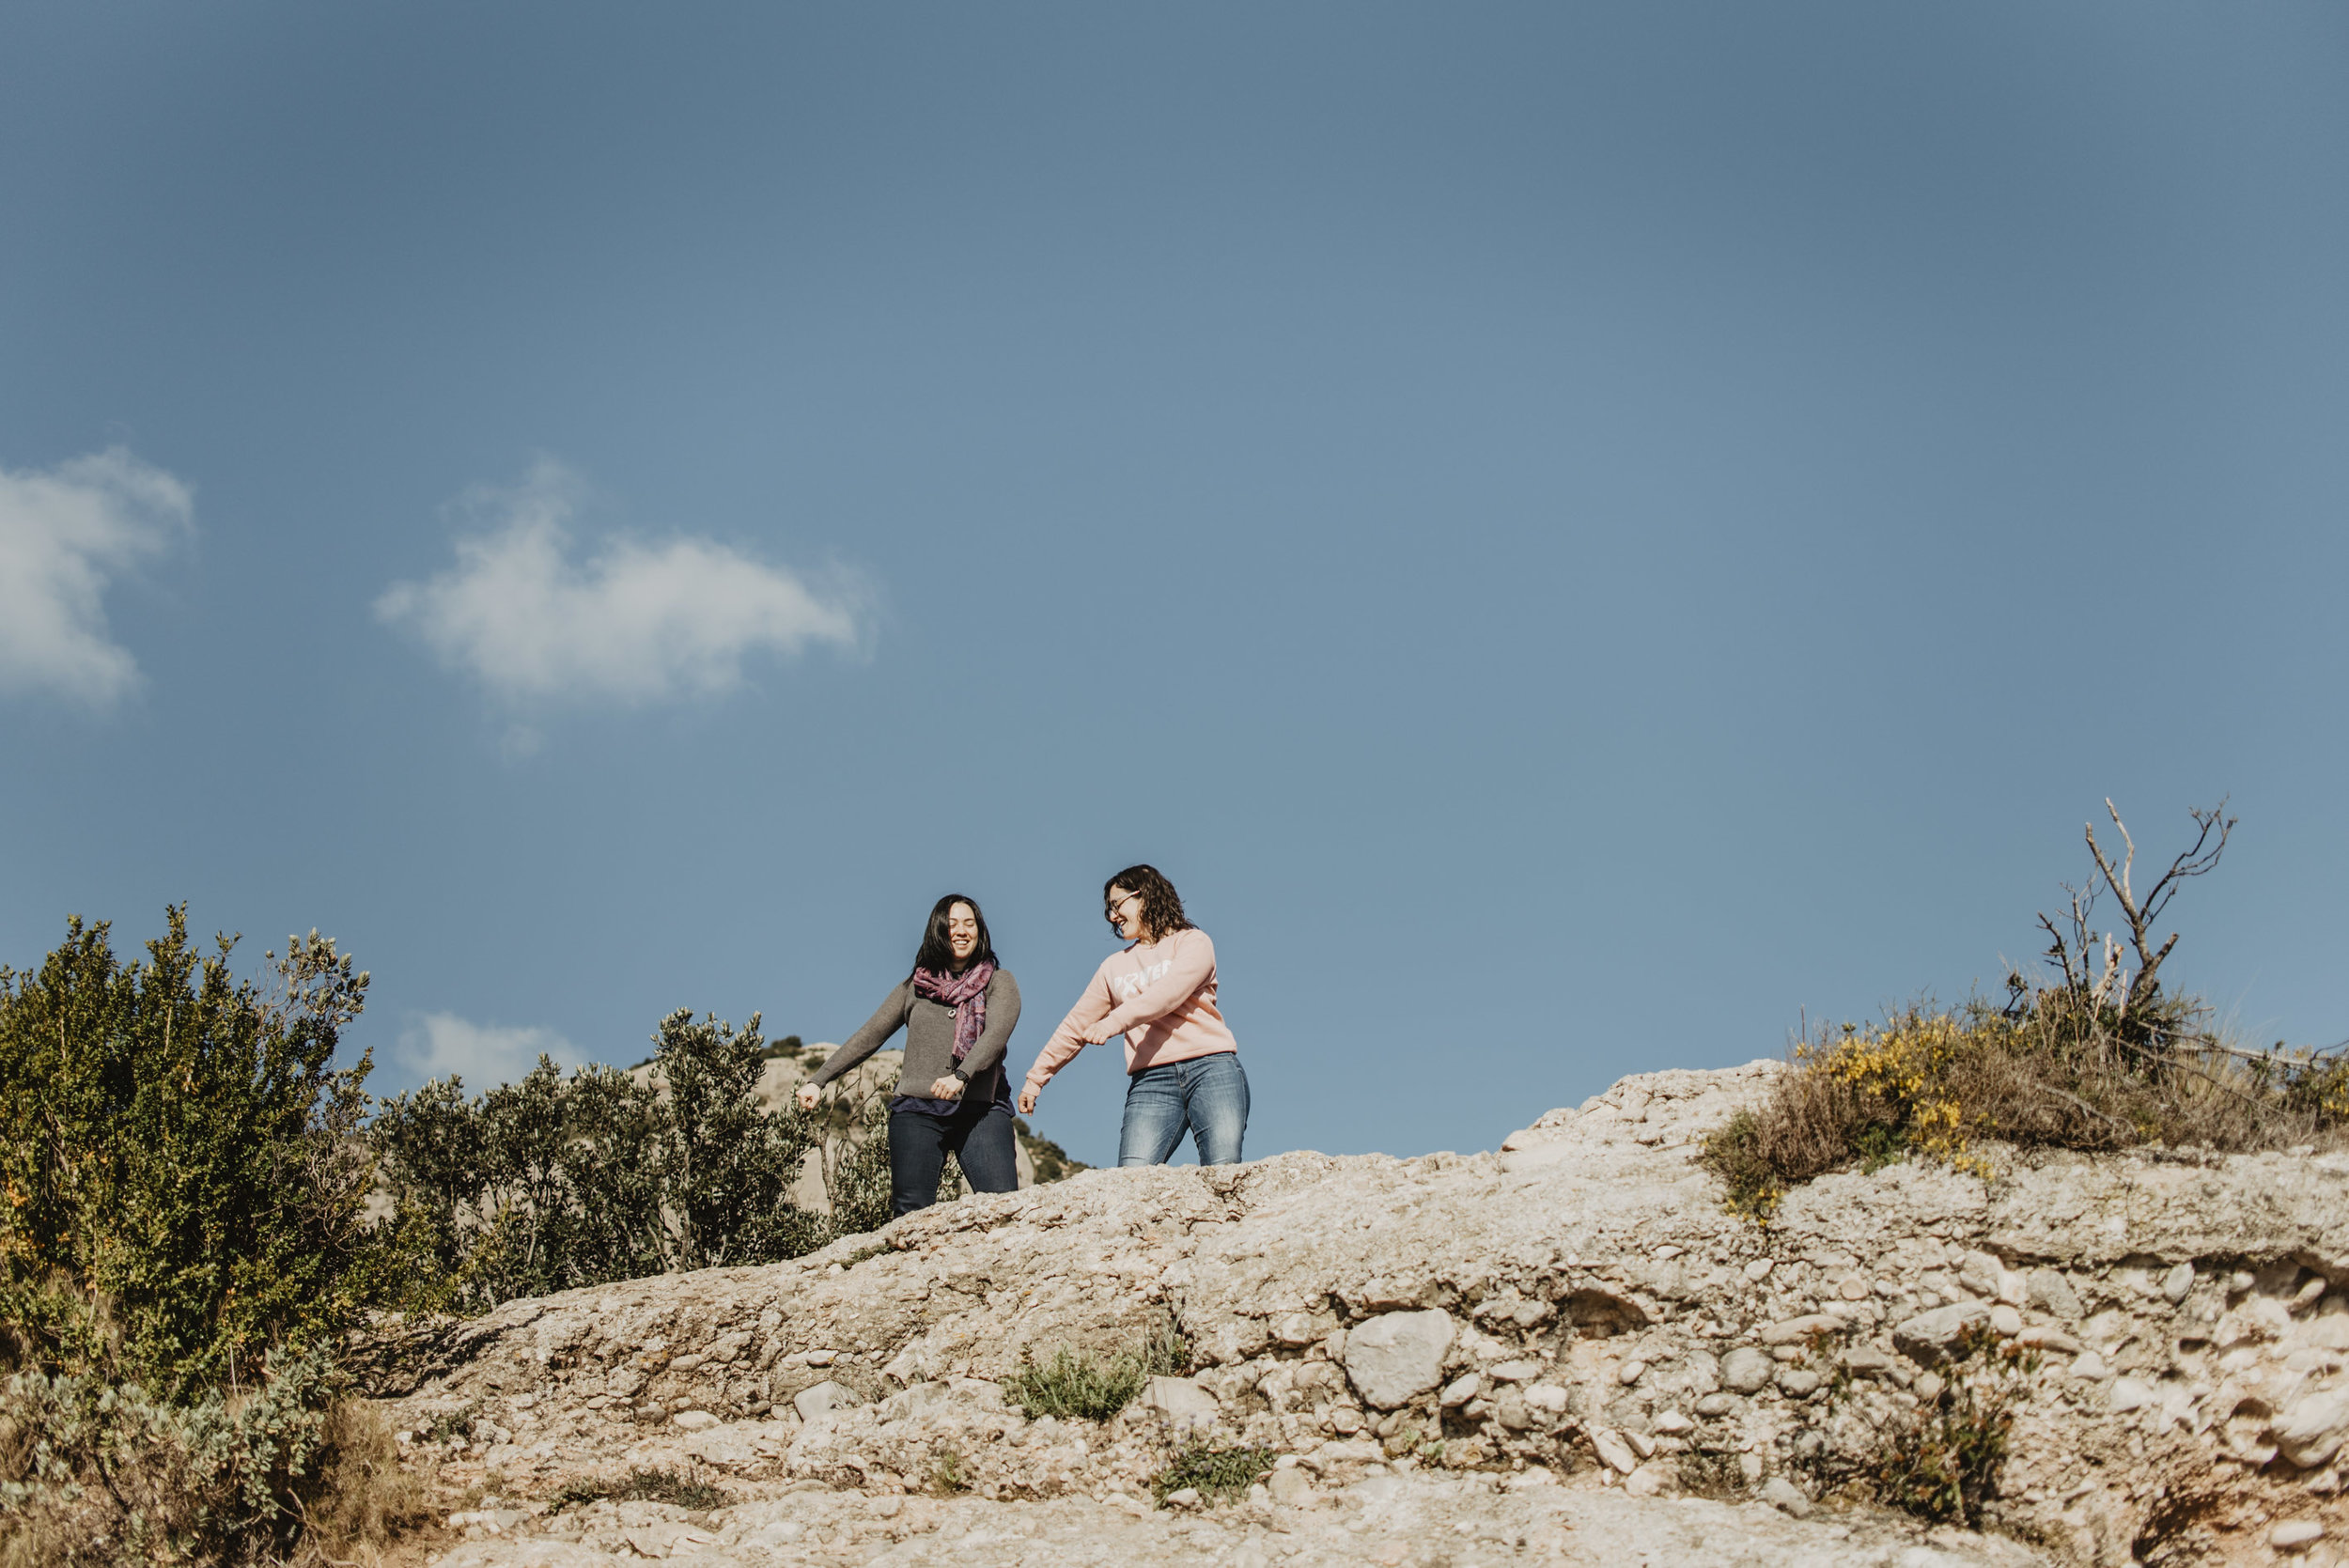 pareja-montserrat-mia-moments-photo-fotografia-sesión-fotos-chicas-11.jpg